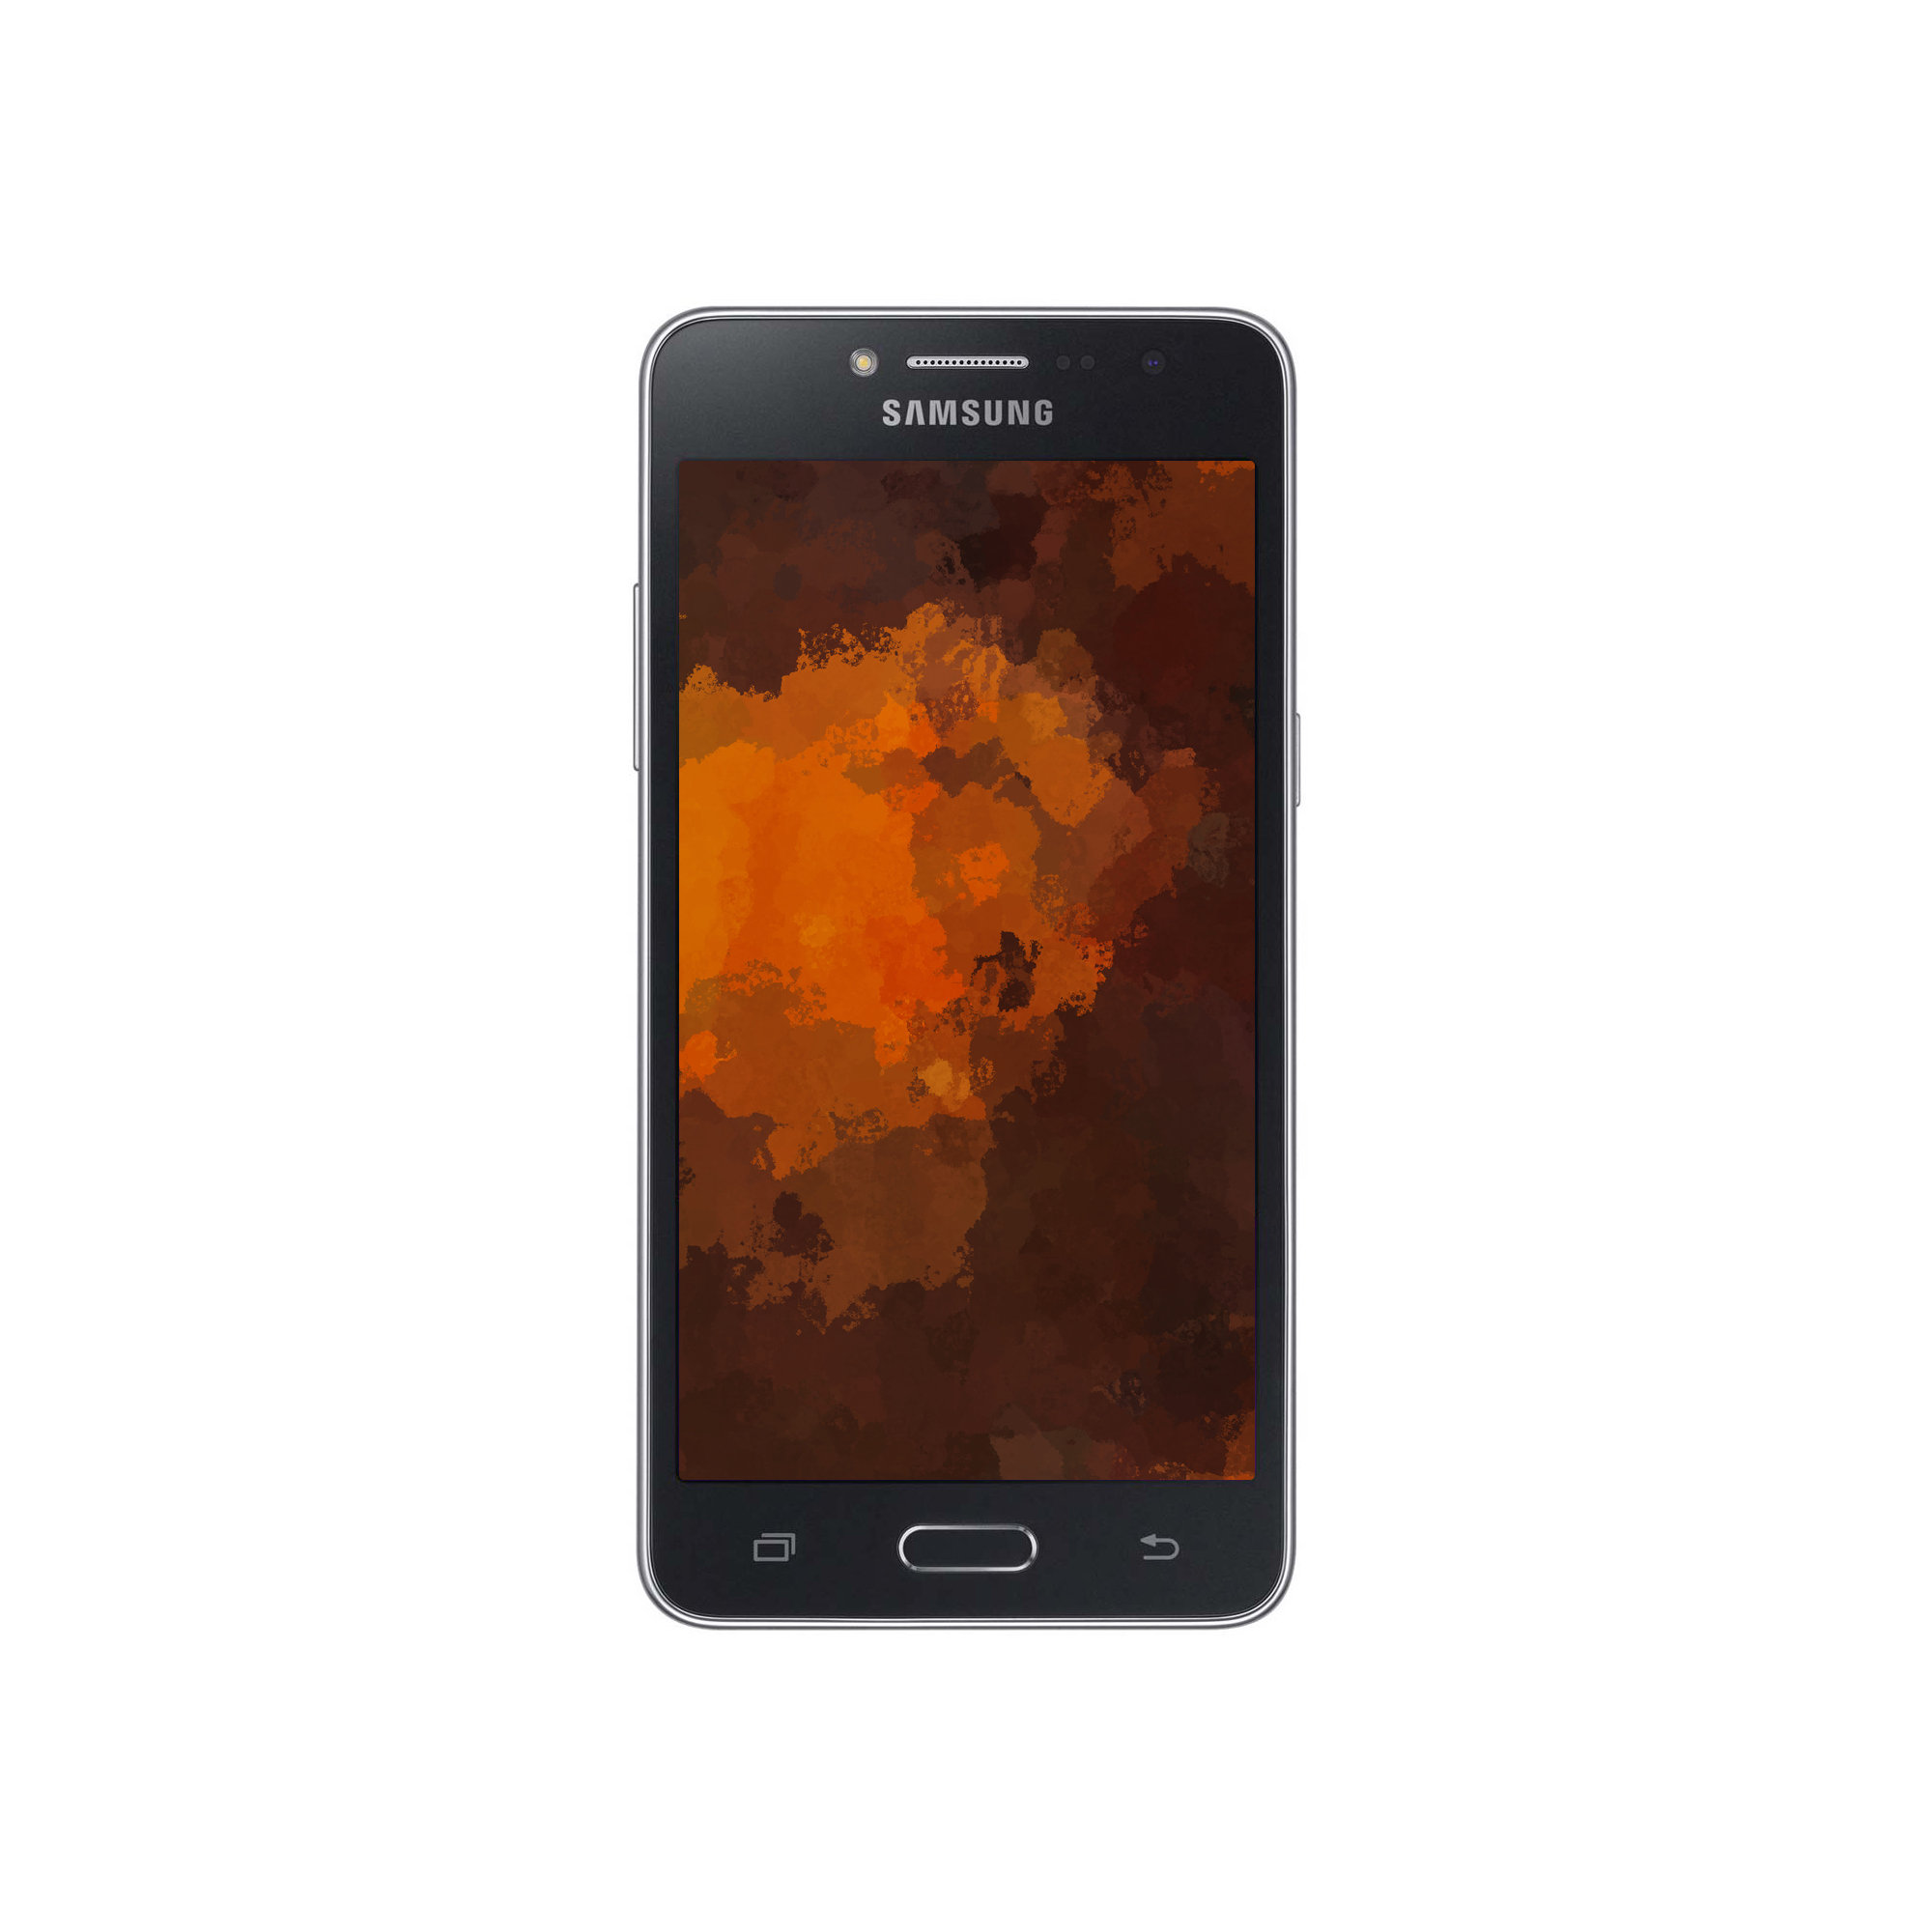 Cocoa Wallpaper Samsung Galaxy J2 Prime Radim Kacer